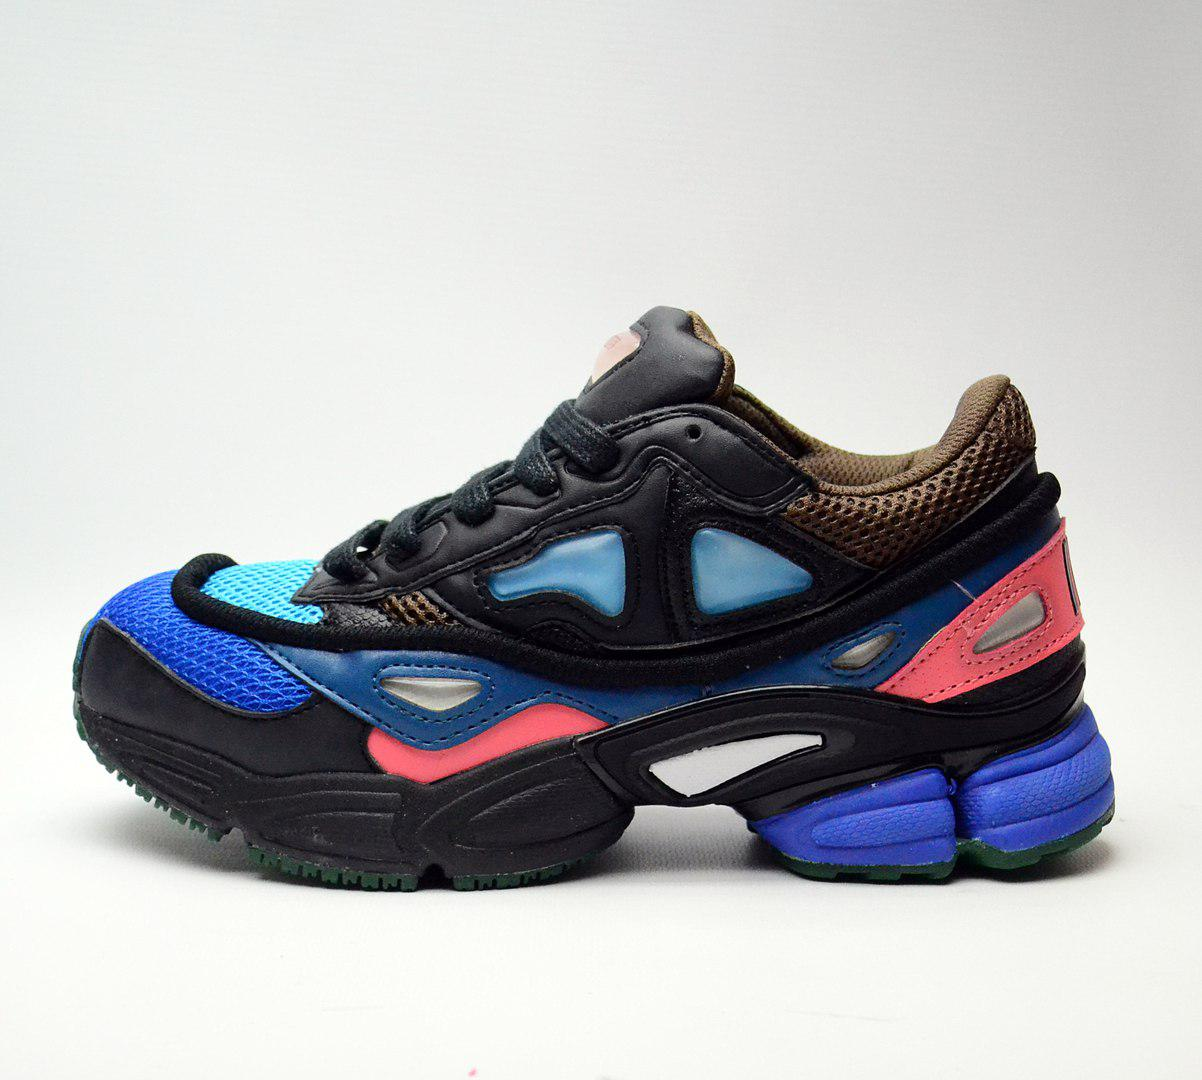 Adidas raf simons ozweego 2 купить украина